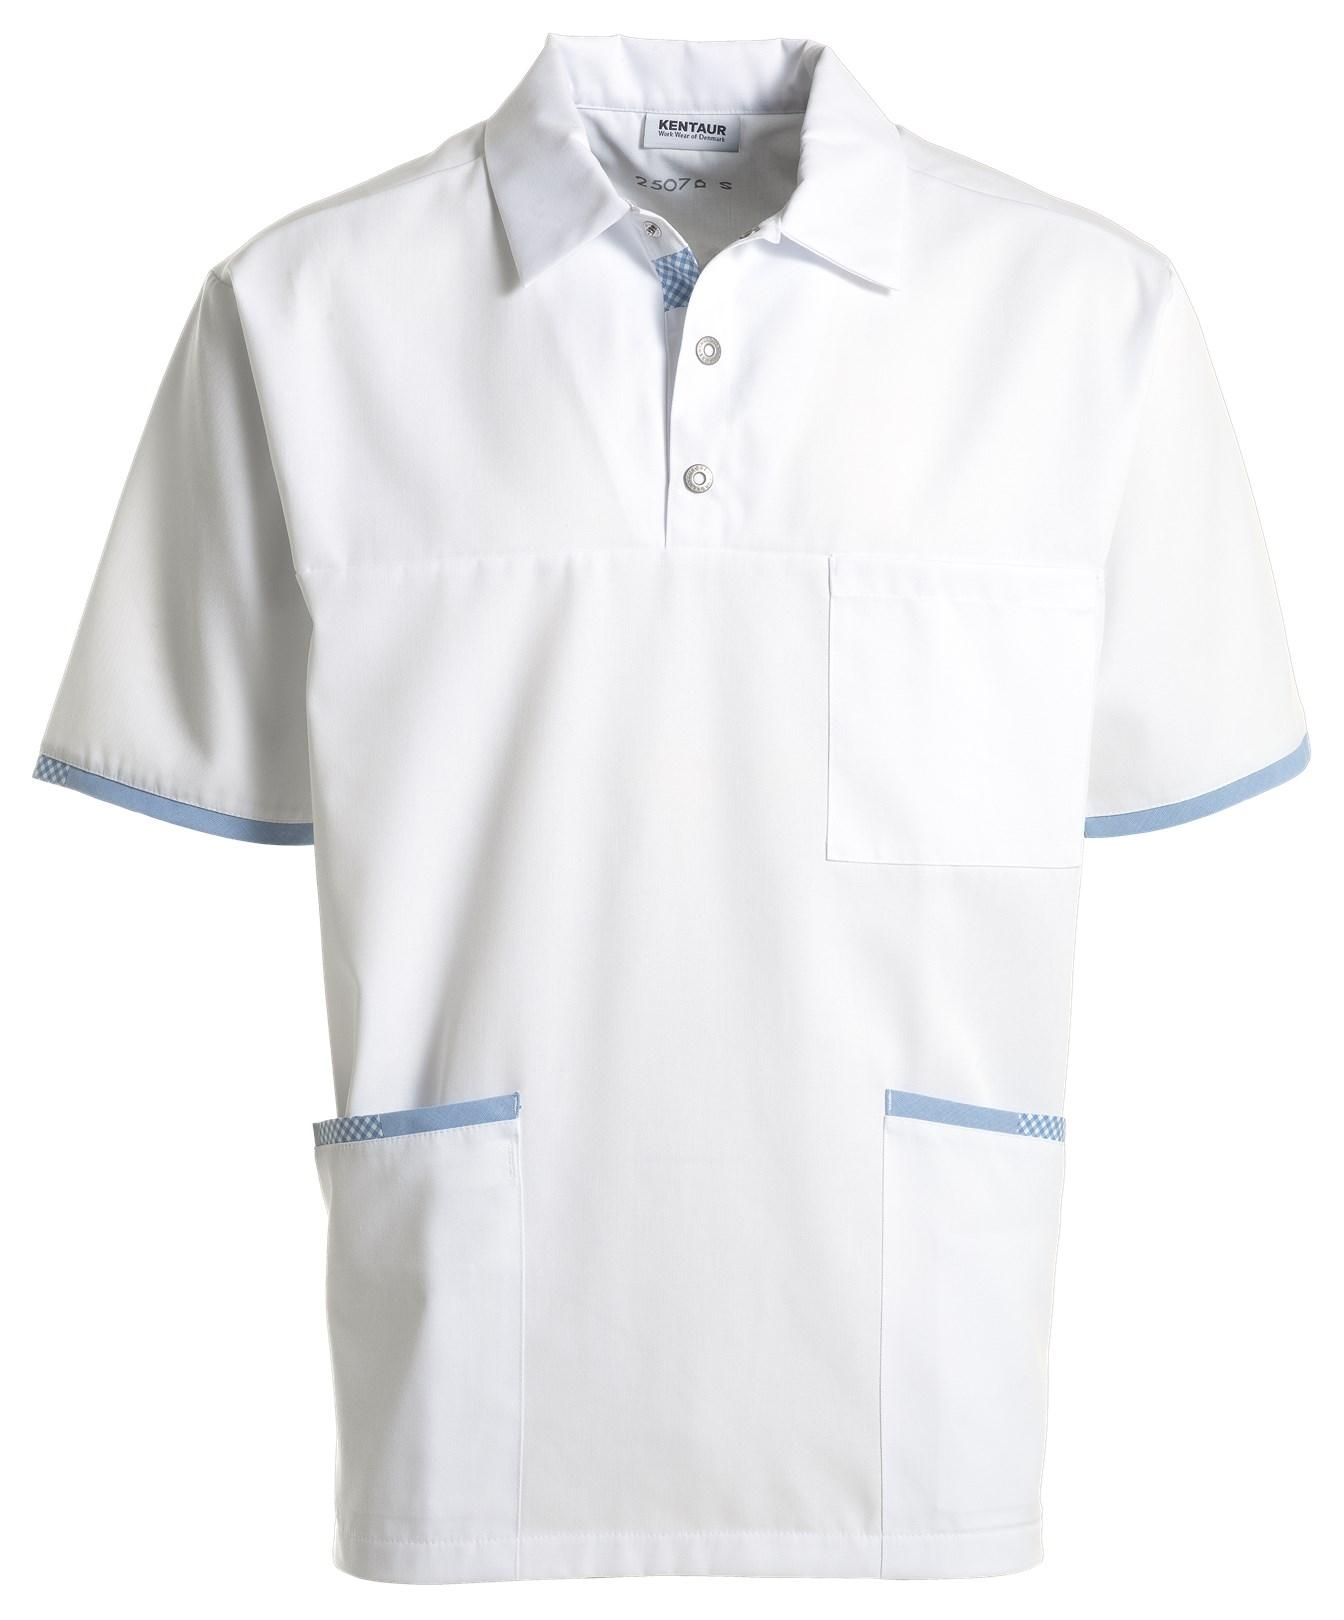 unisex hes wit/blauw geruit